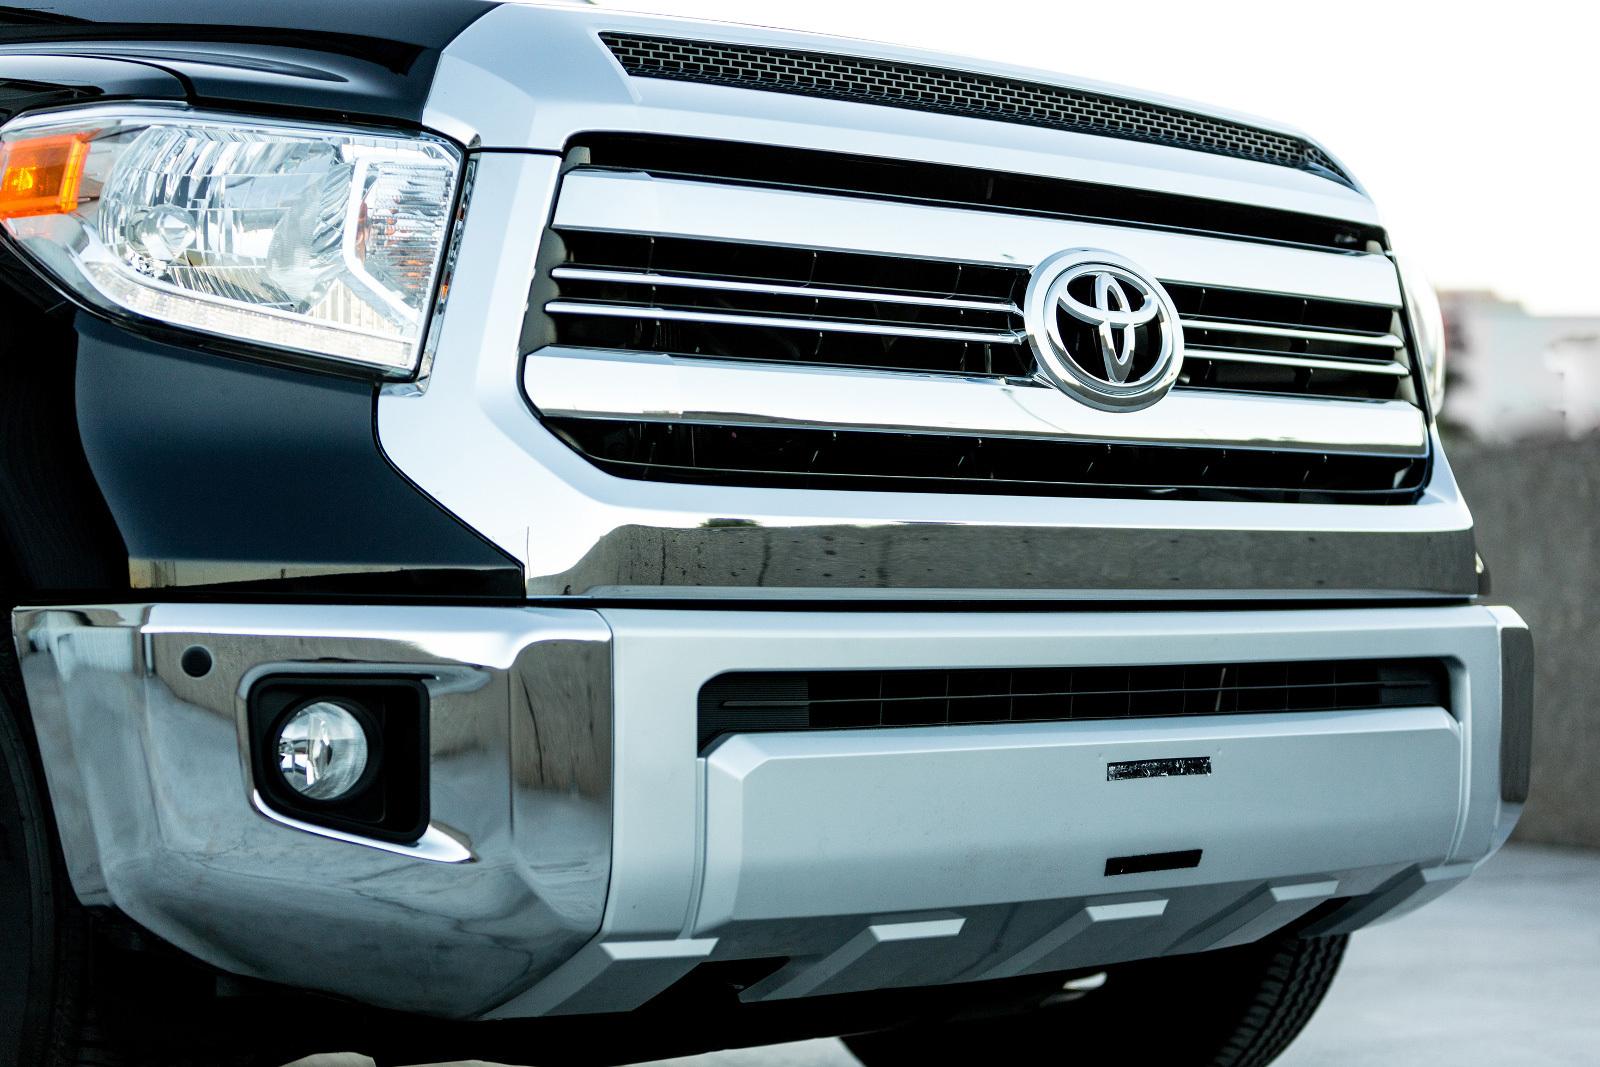 Foto de Toyota Tundrasine concept (4/9)